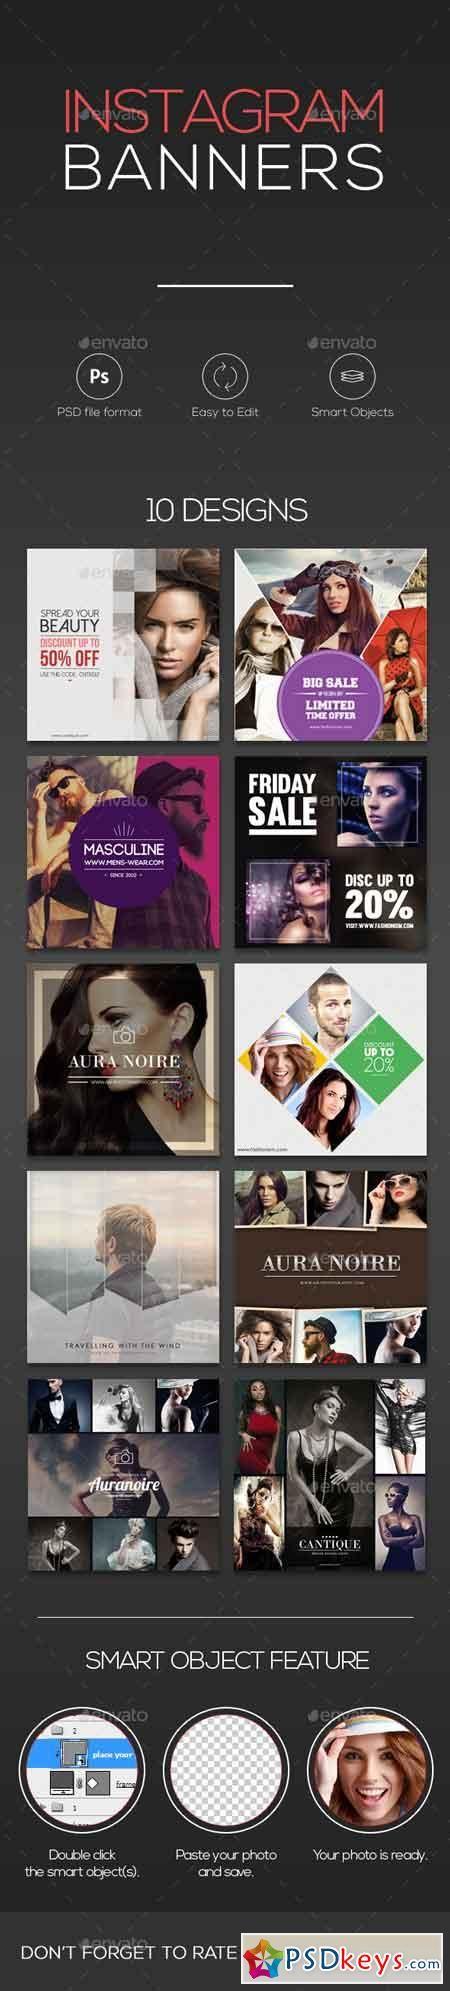 10 Instagram Banners 15737607